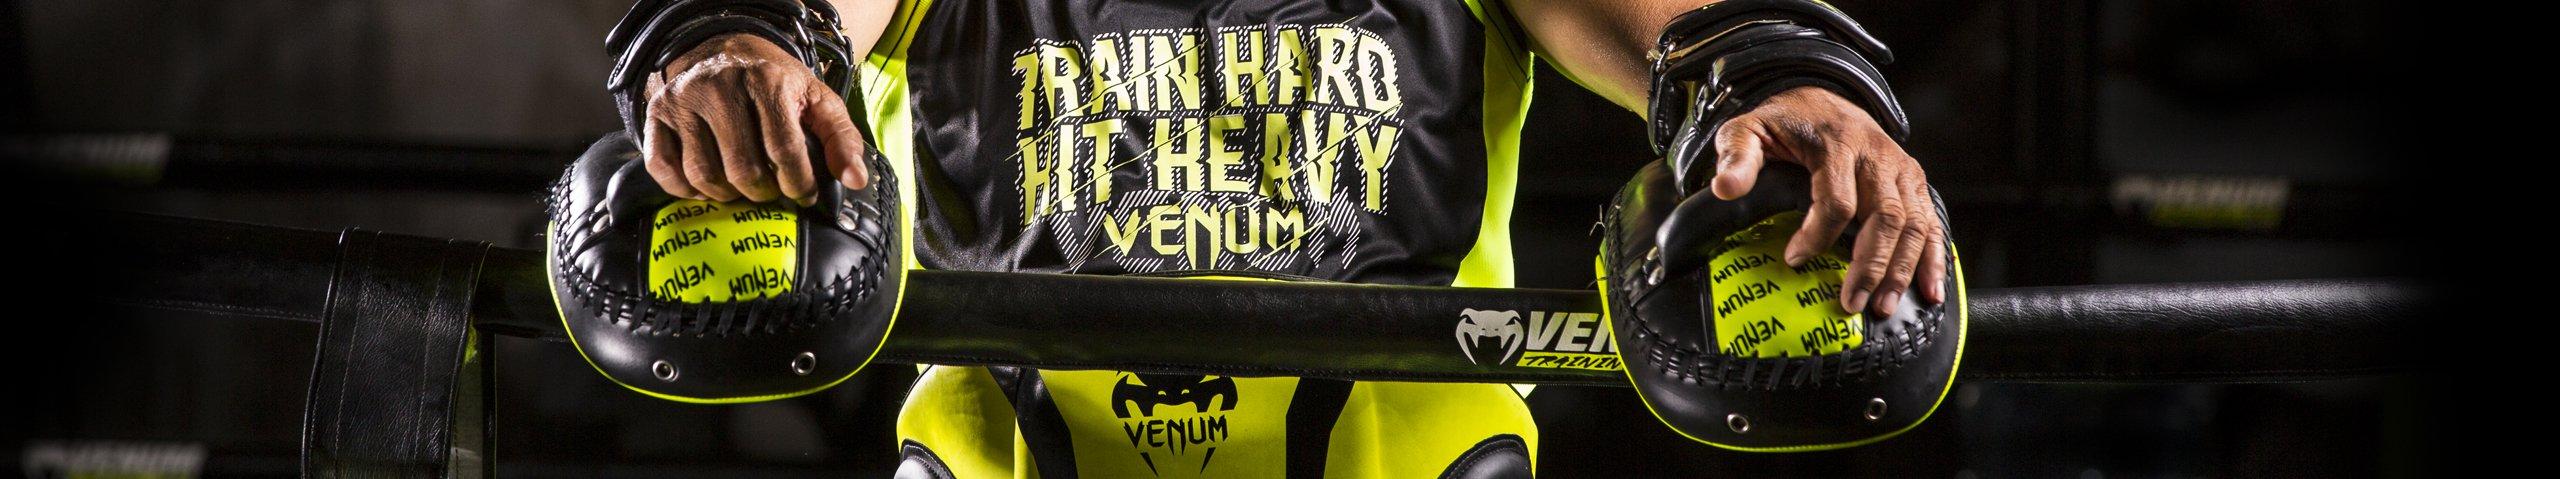 Venum Coaching - Venum.com Europe